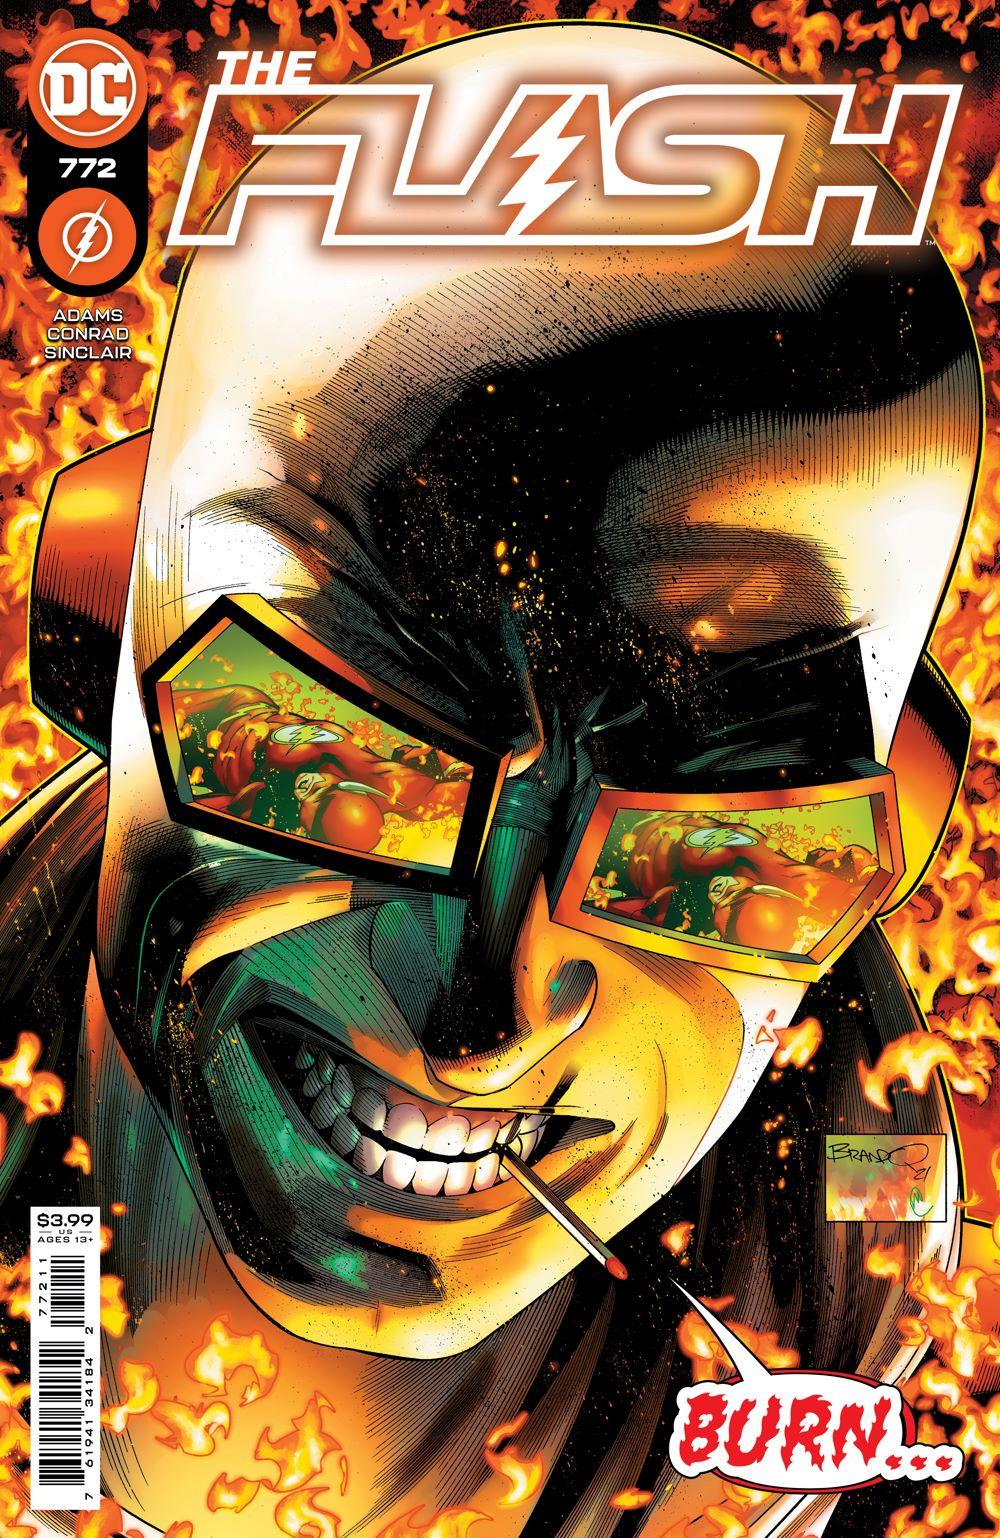 THEFLASH_Cv772 DC Comics July 2021 Solicitations